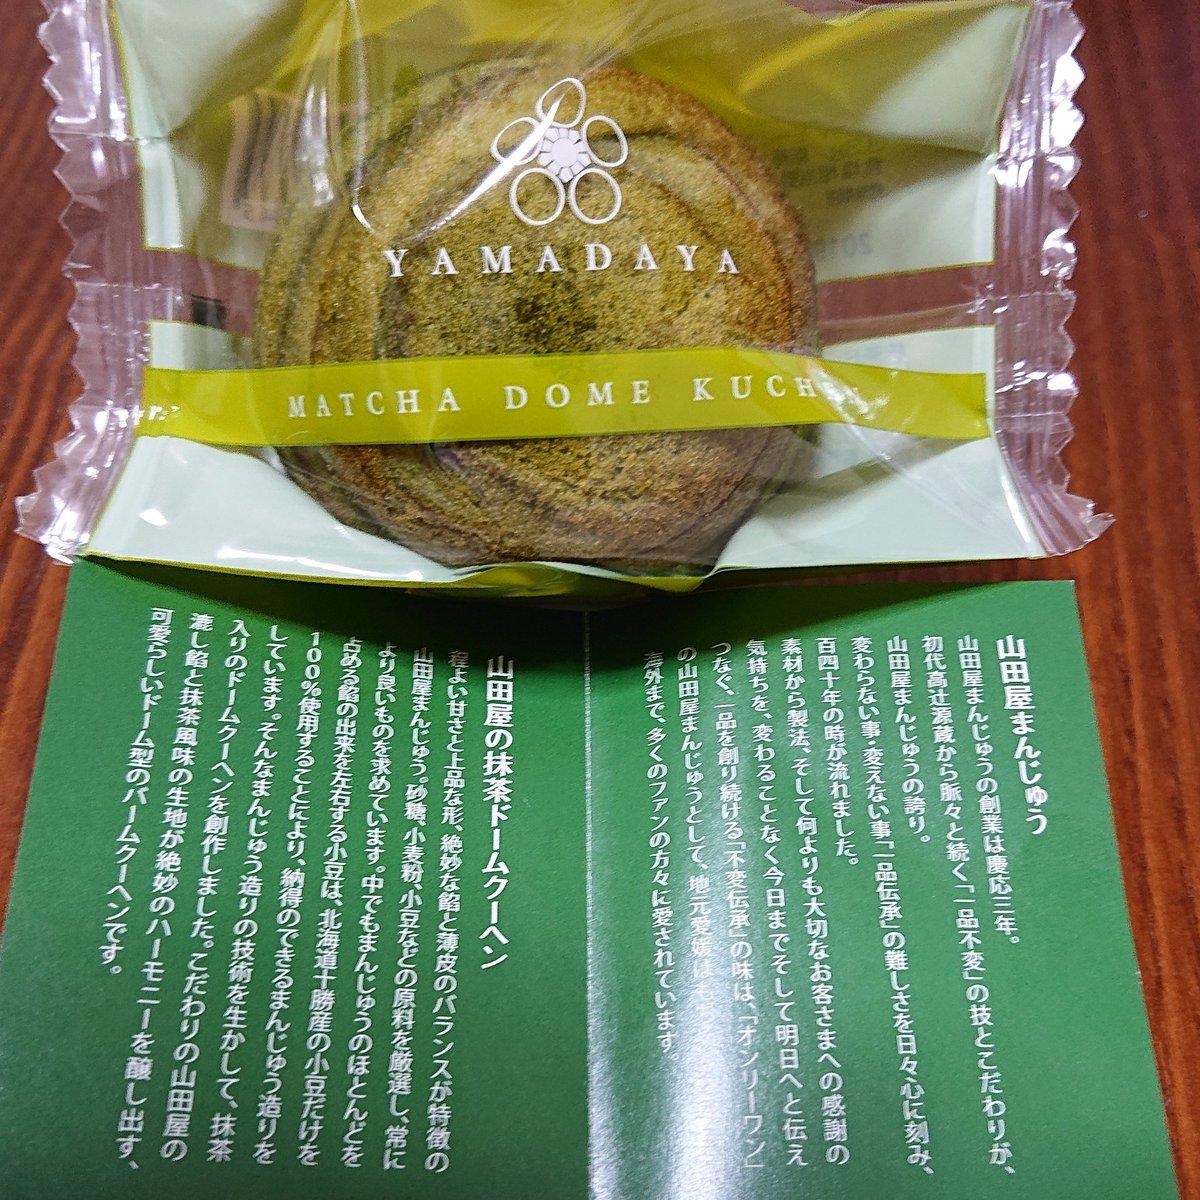 test ツイッターメディア - 山田屋の抹茶ドームクーヘンを買ってみた。 やはり、自分的には山田屋まんじゅうの方がしっくりくる感じ?! 興味のある方は、試しあれ。 https://t.co/5QWCneZVNr